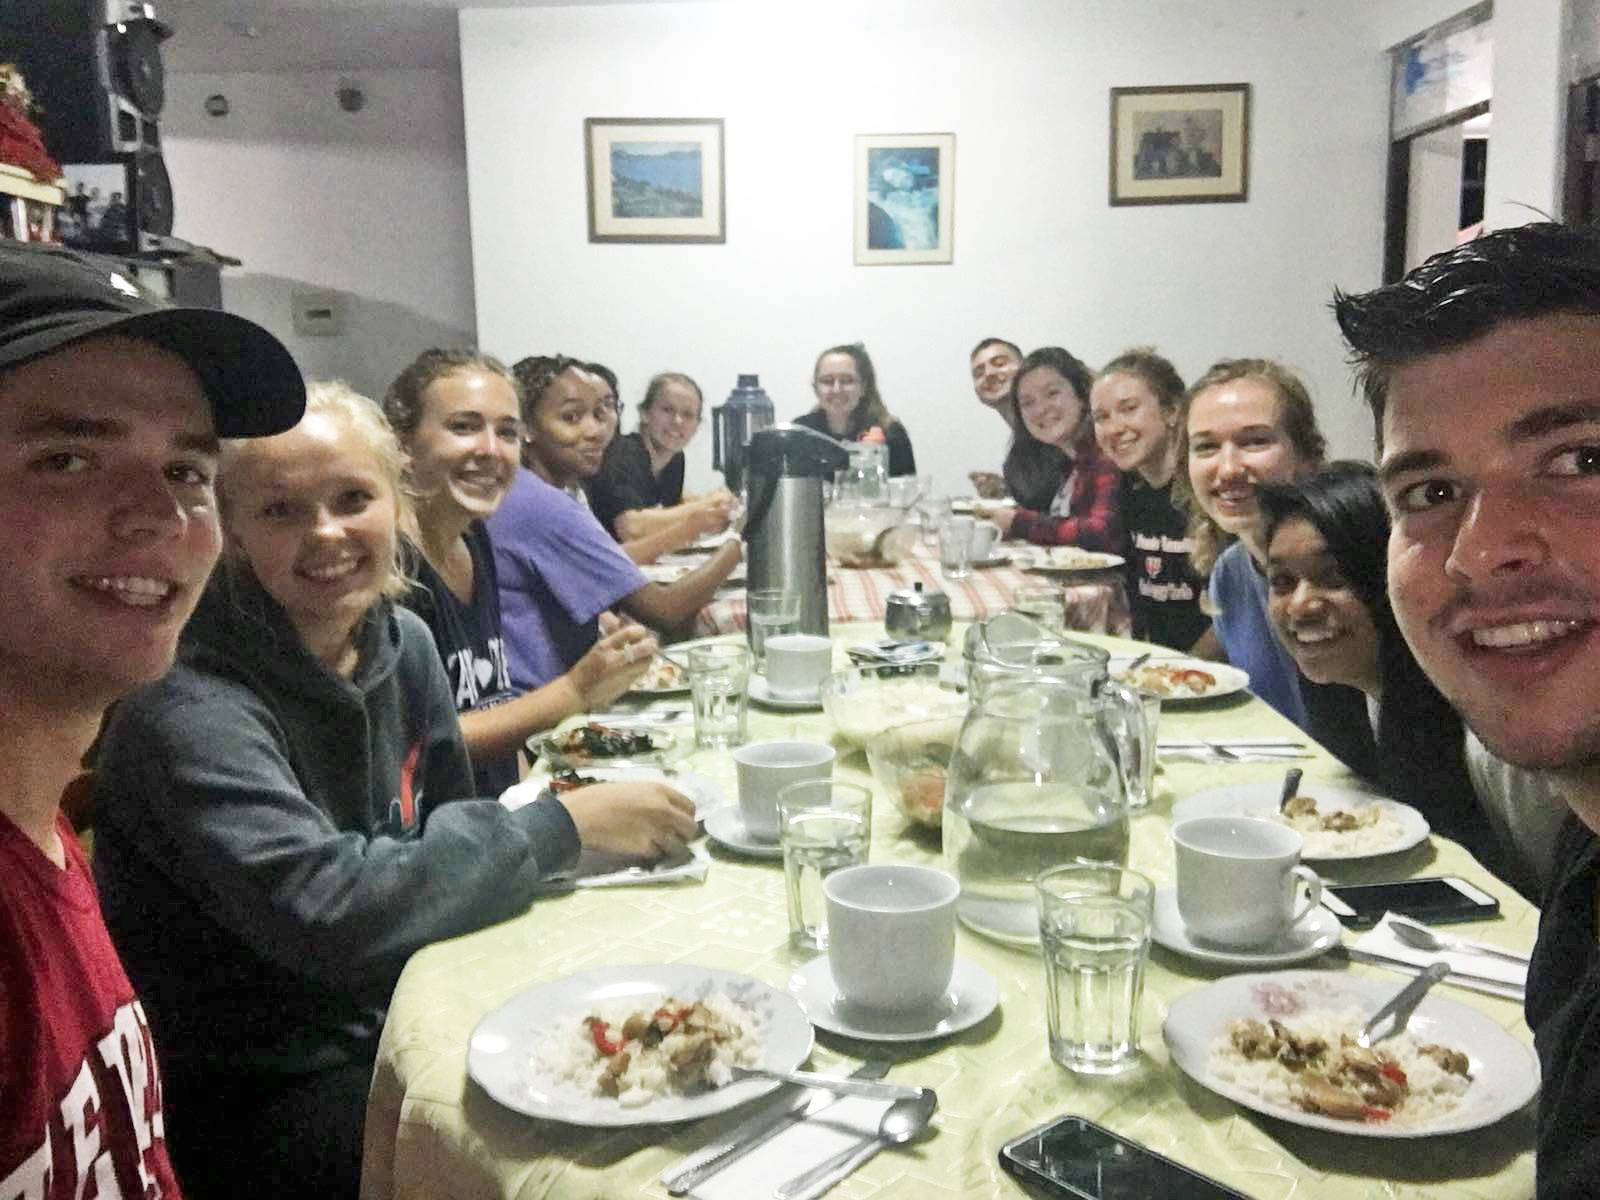 SIHFers who serve together, eat together... La Merced, Peru